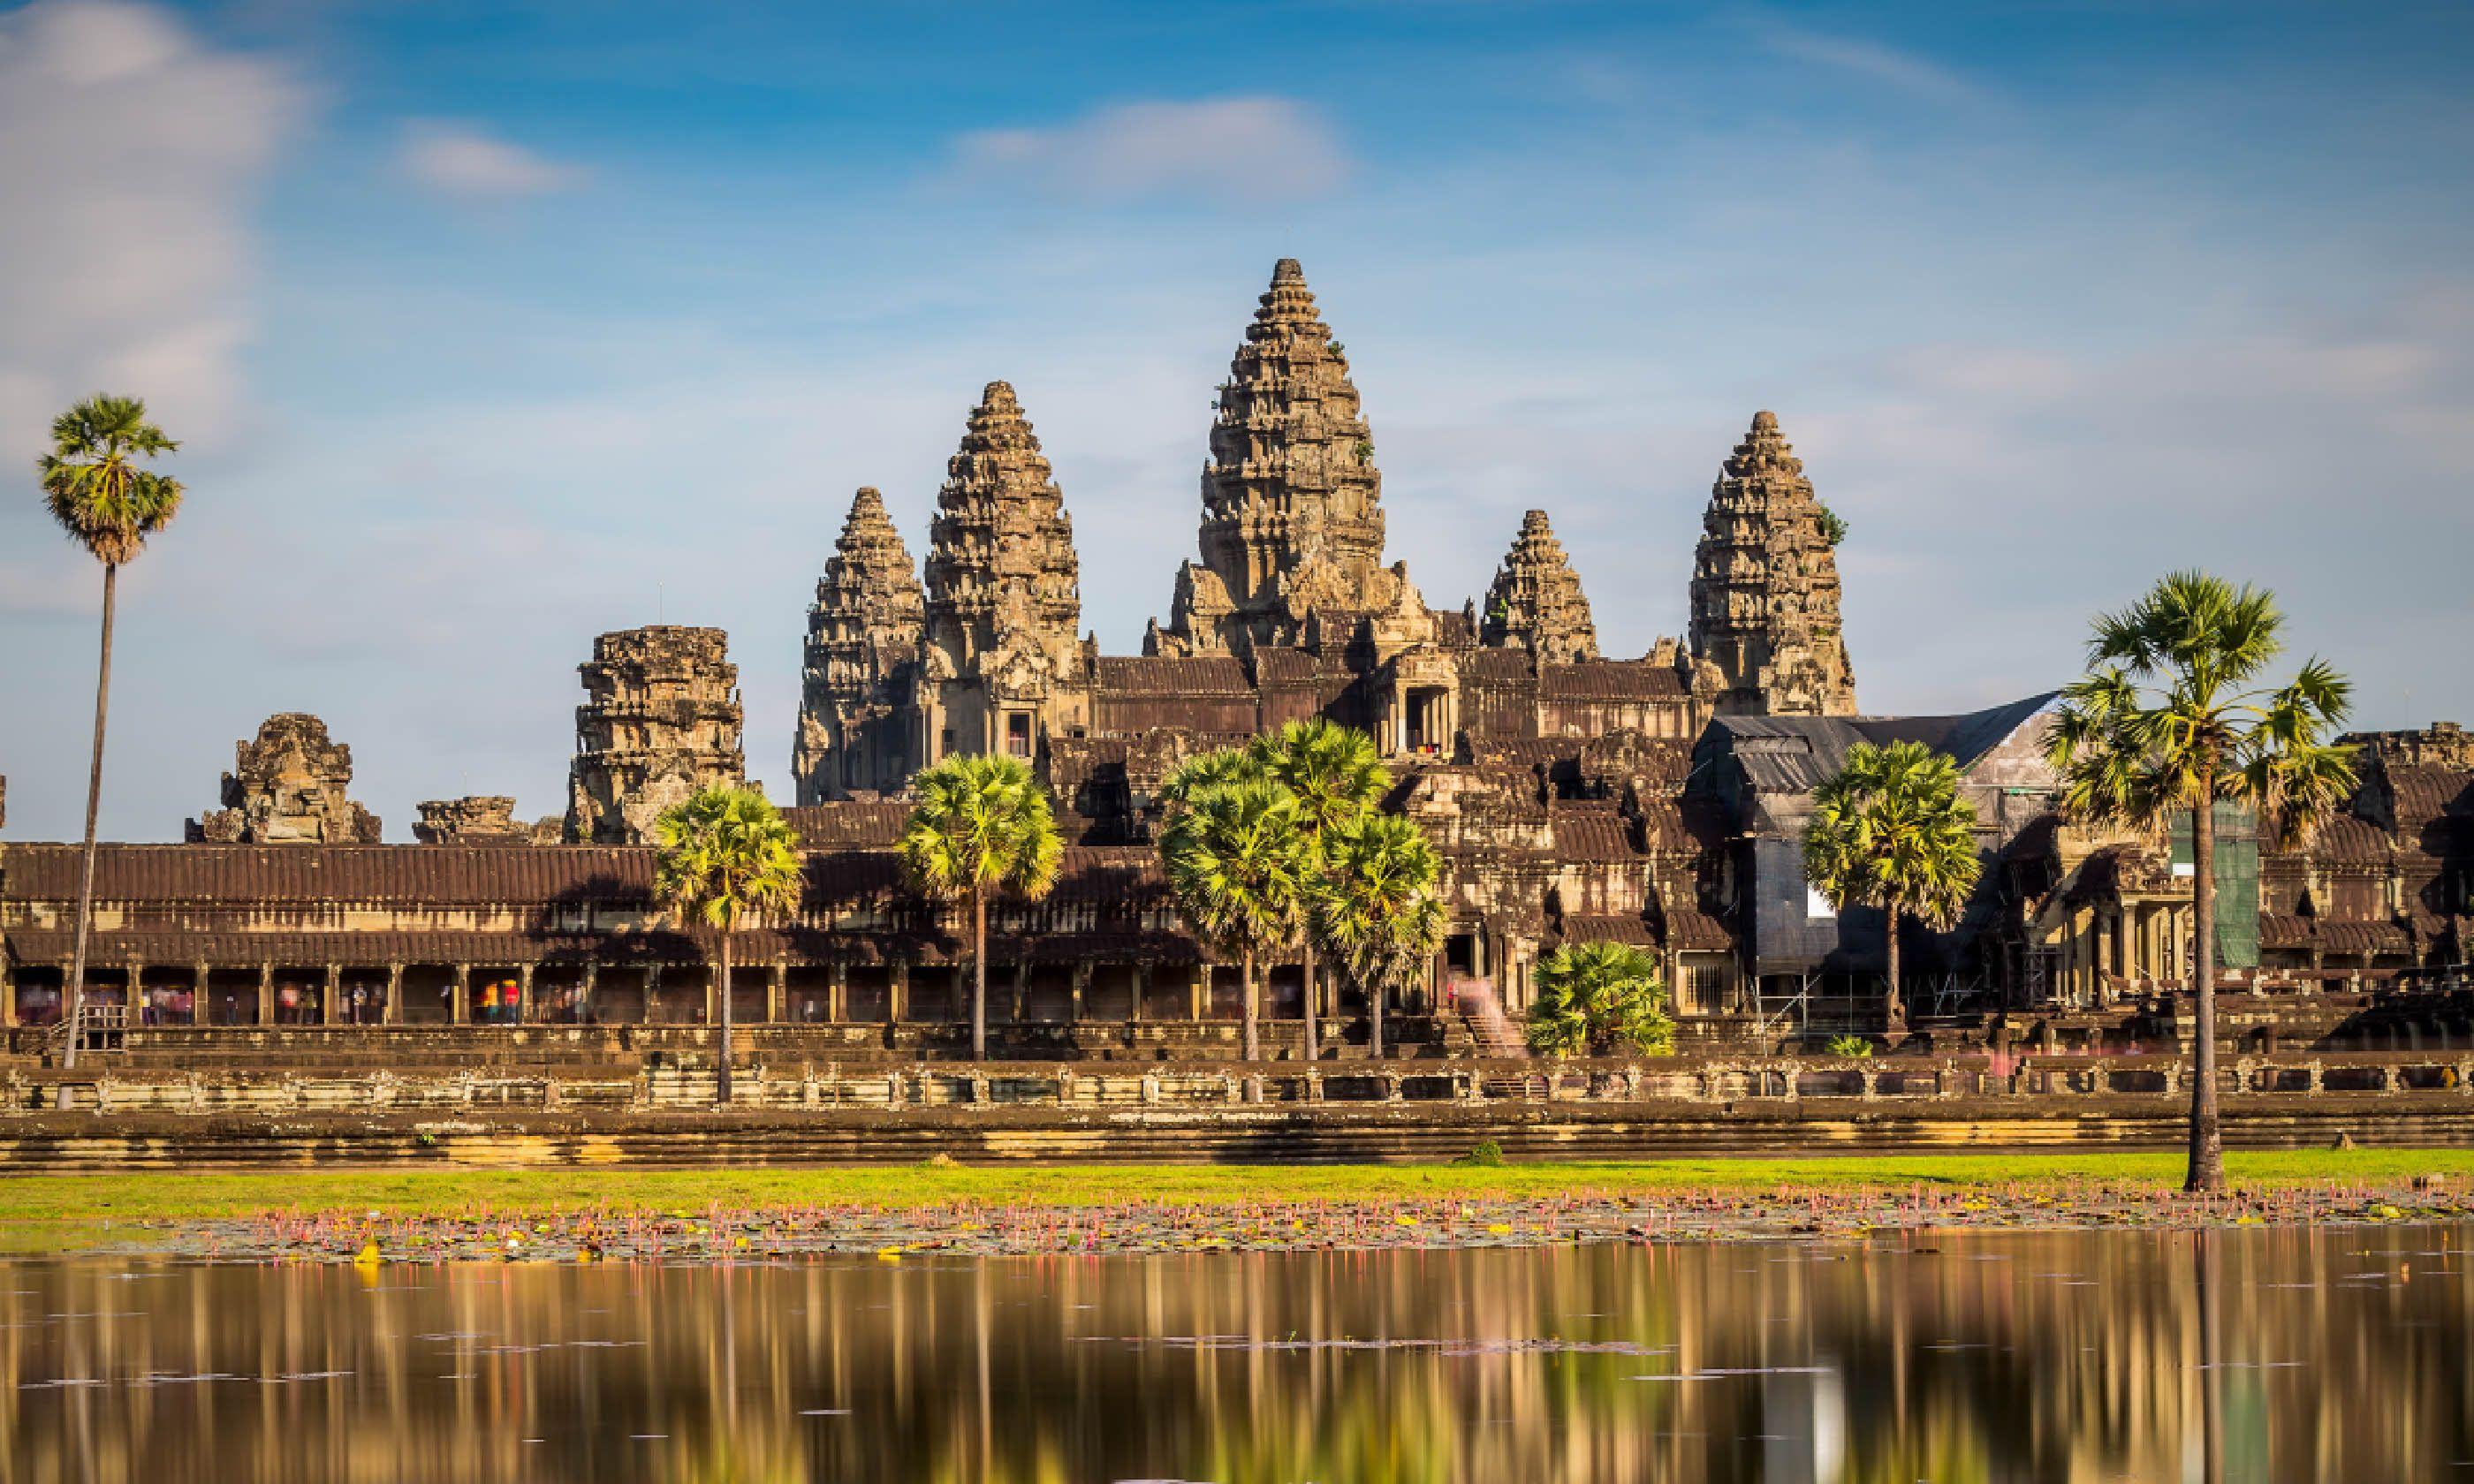 Angkor Wat, Cambodia (Shutterstock)